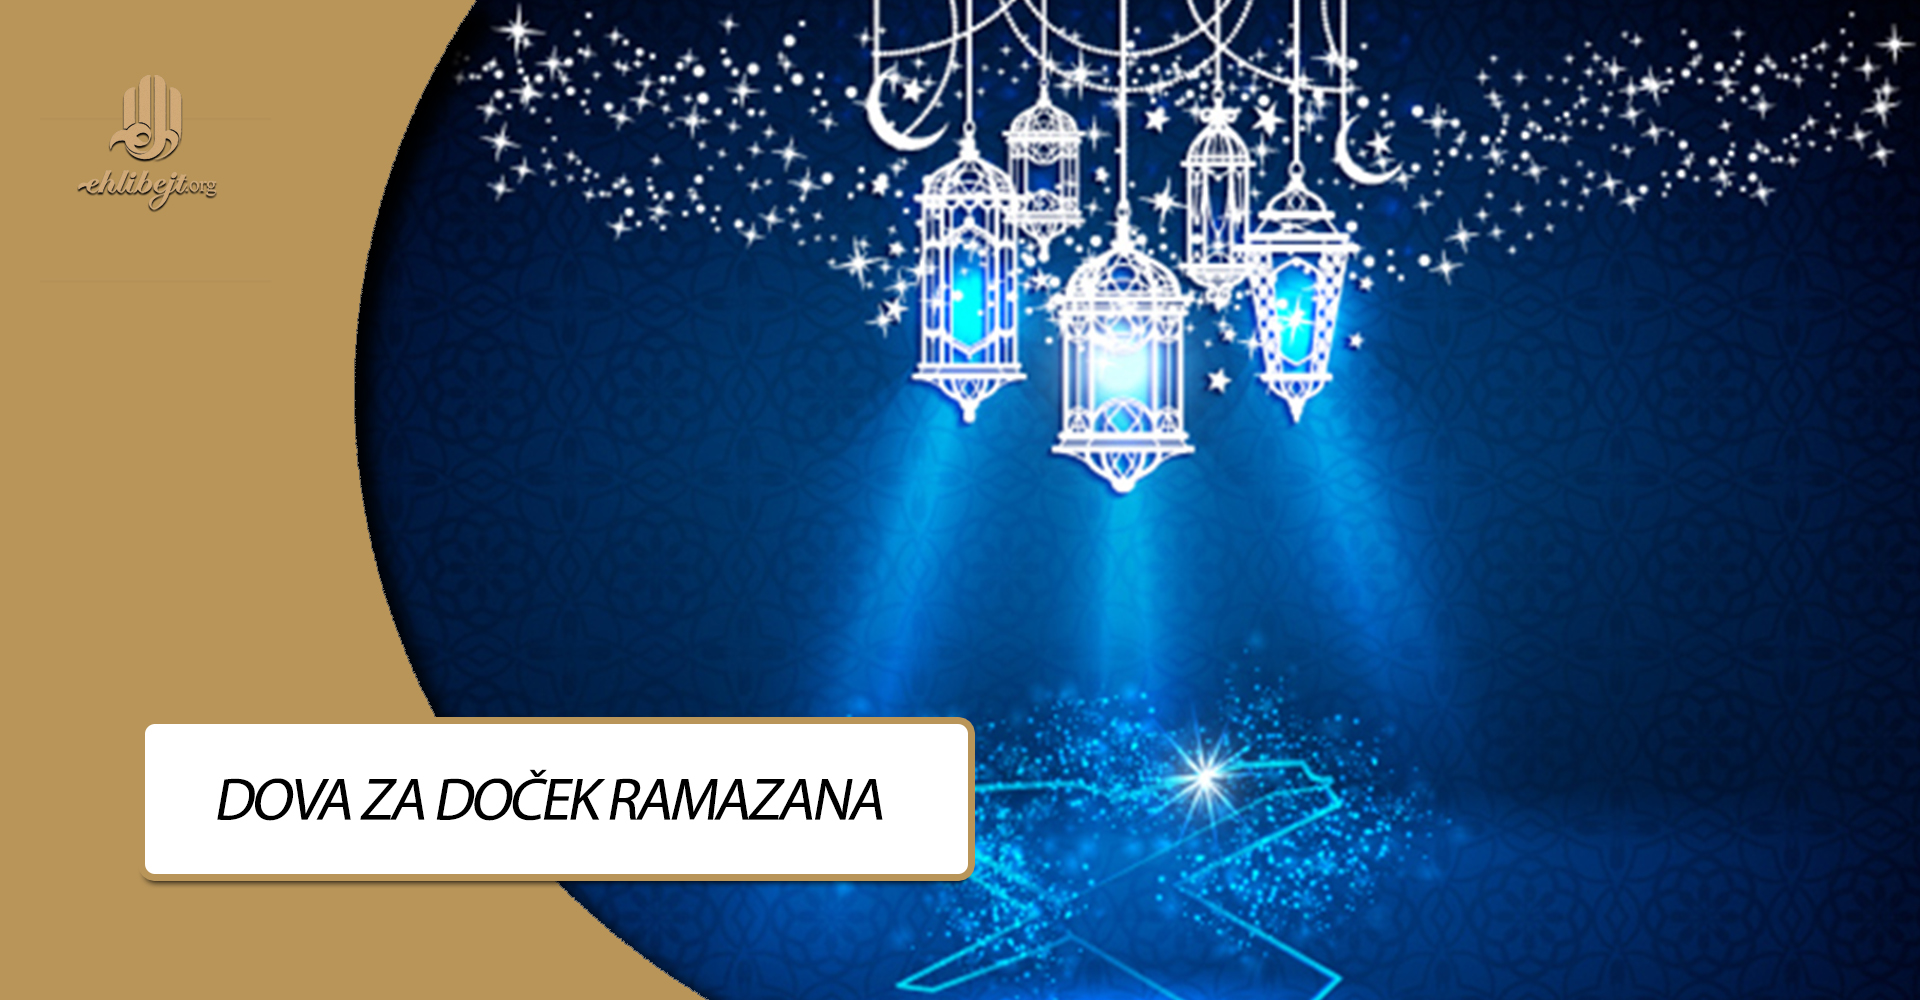 Dova za doček ramazana